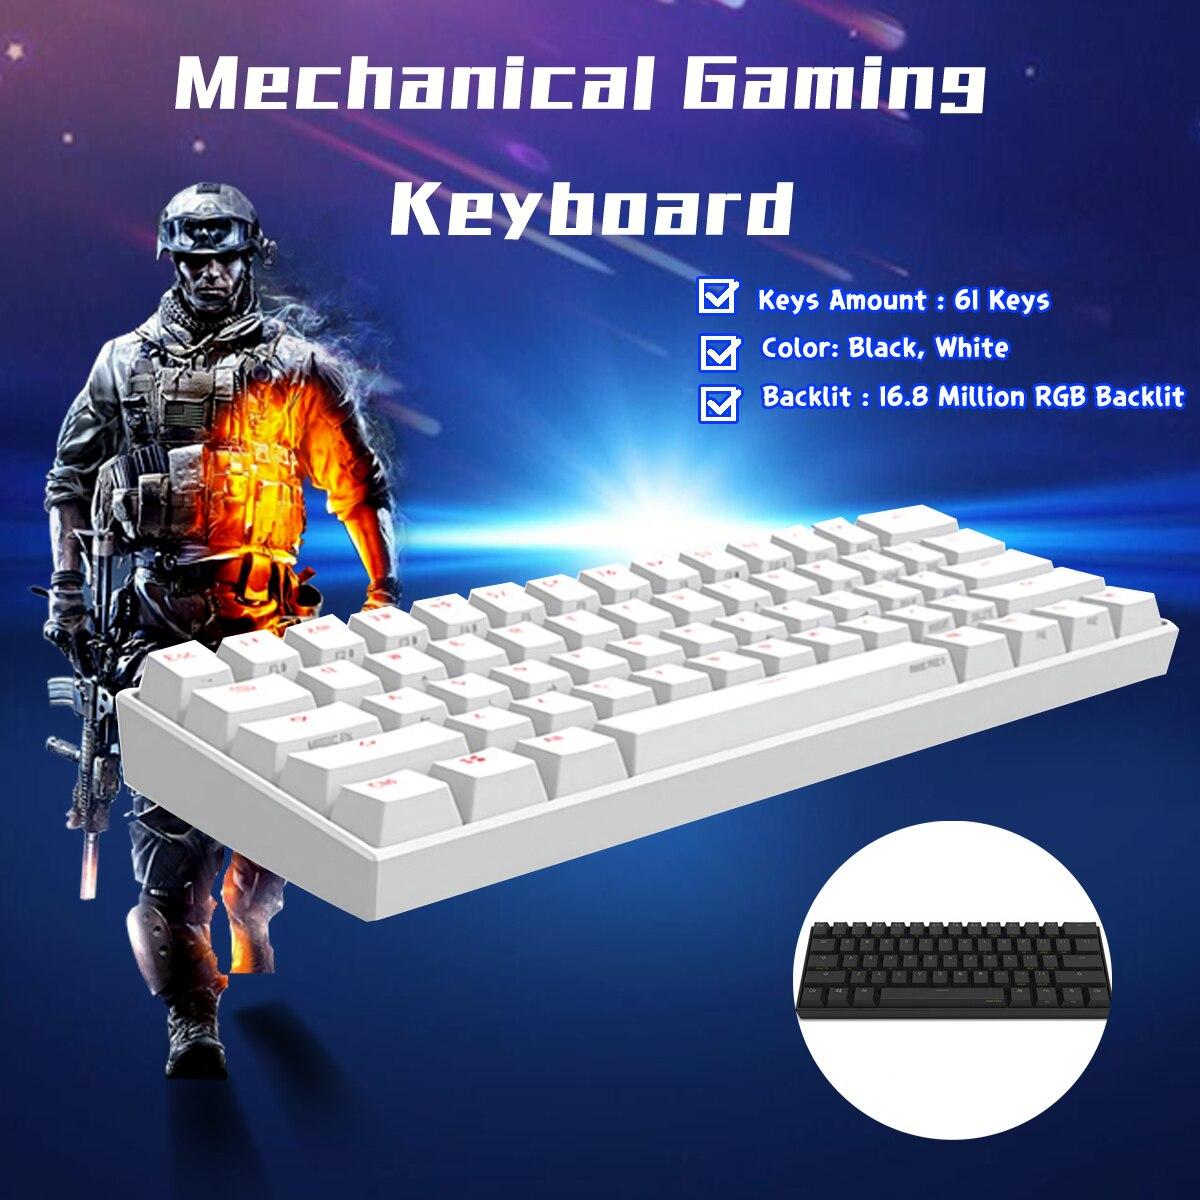 [CAIXA de Interruptor Kailh] Obins Anne Pro 2 60% NKRO bluetooth 4.0 Tipo-C RGB Teclado Gaming Mecânico